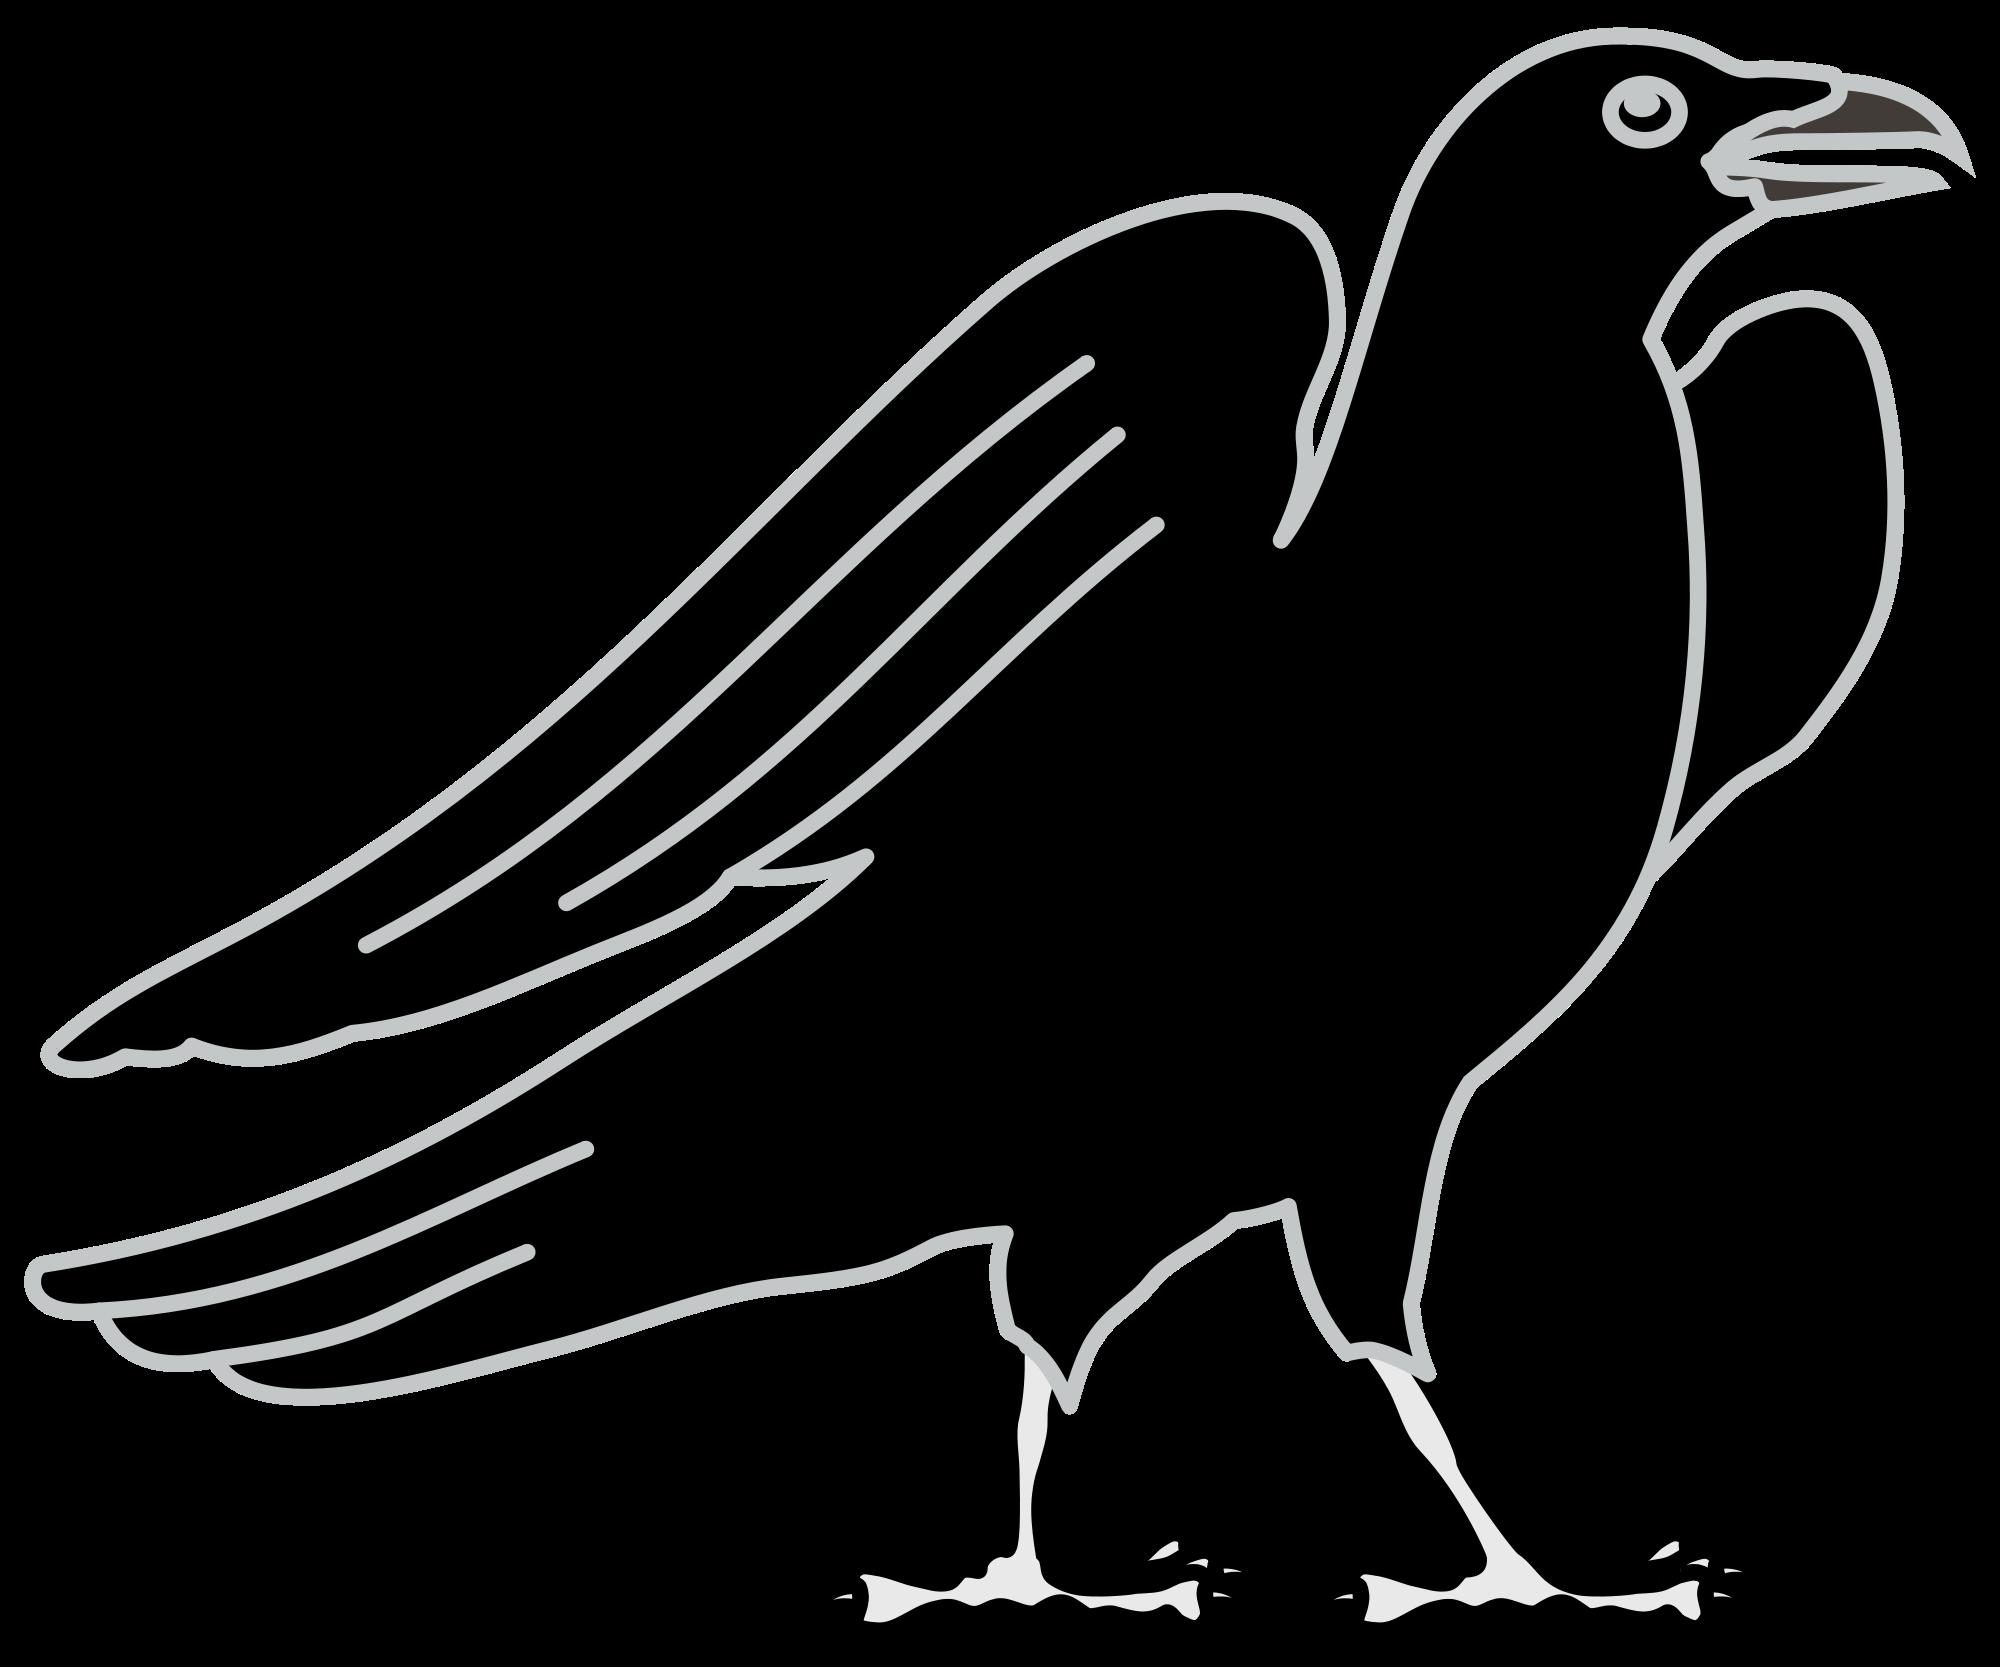 Crow clipart svg. File coa illustration elements